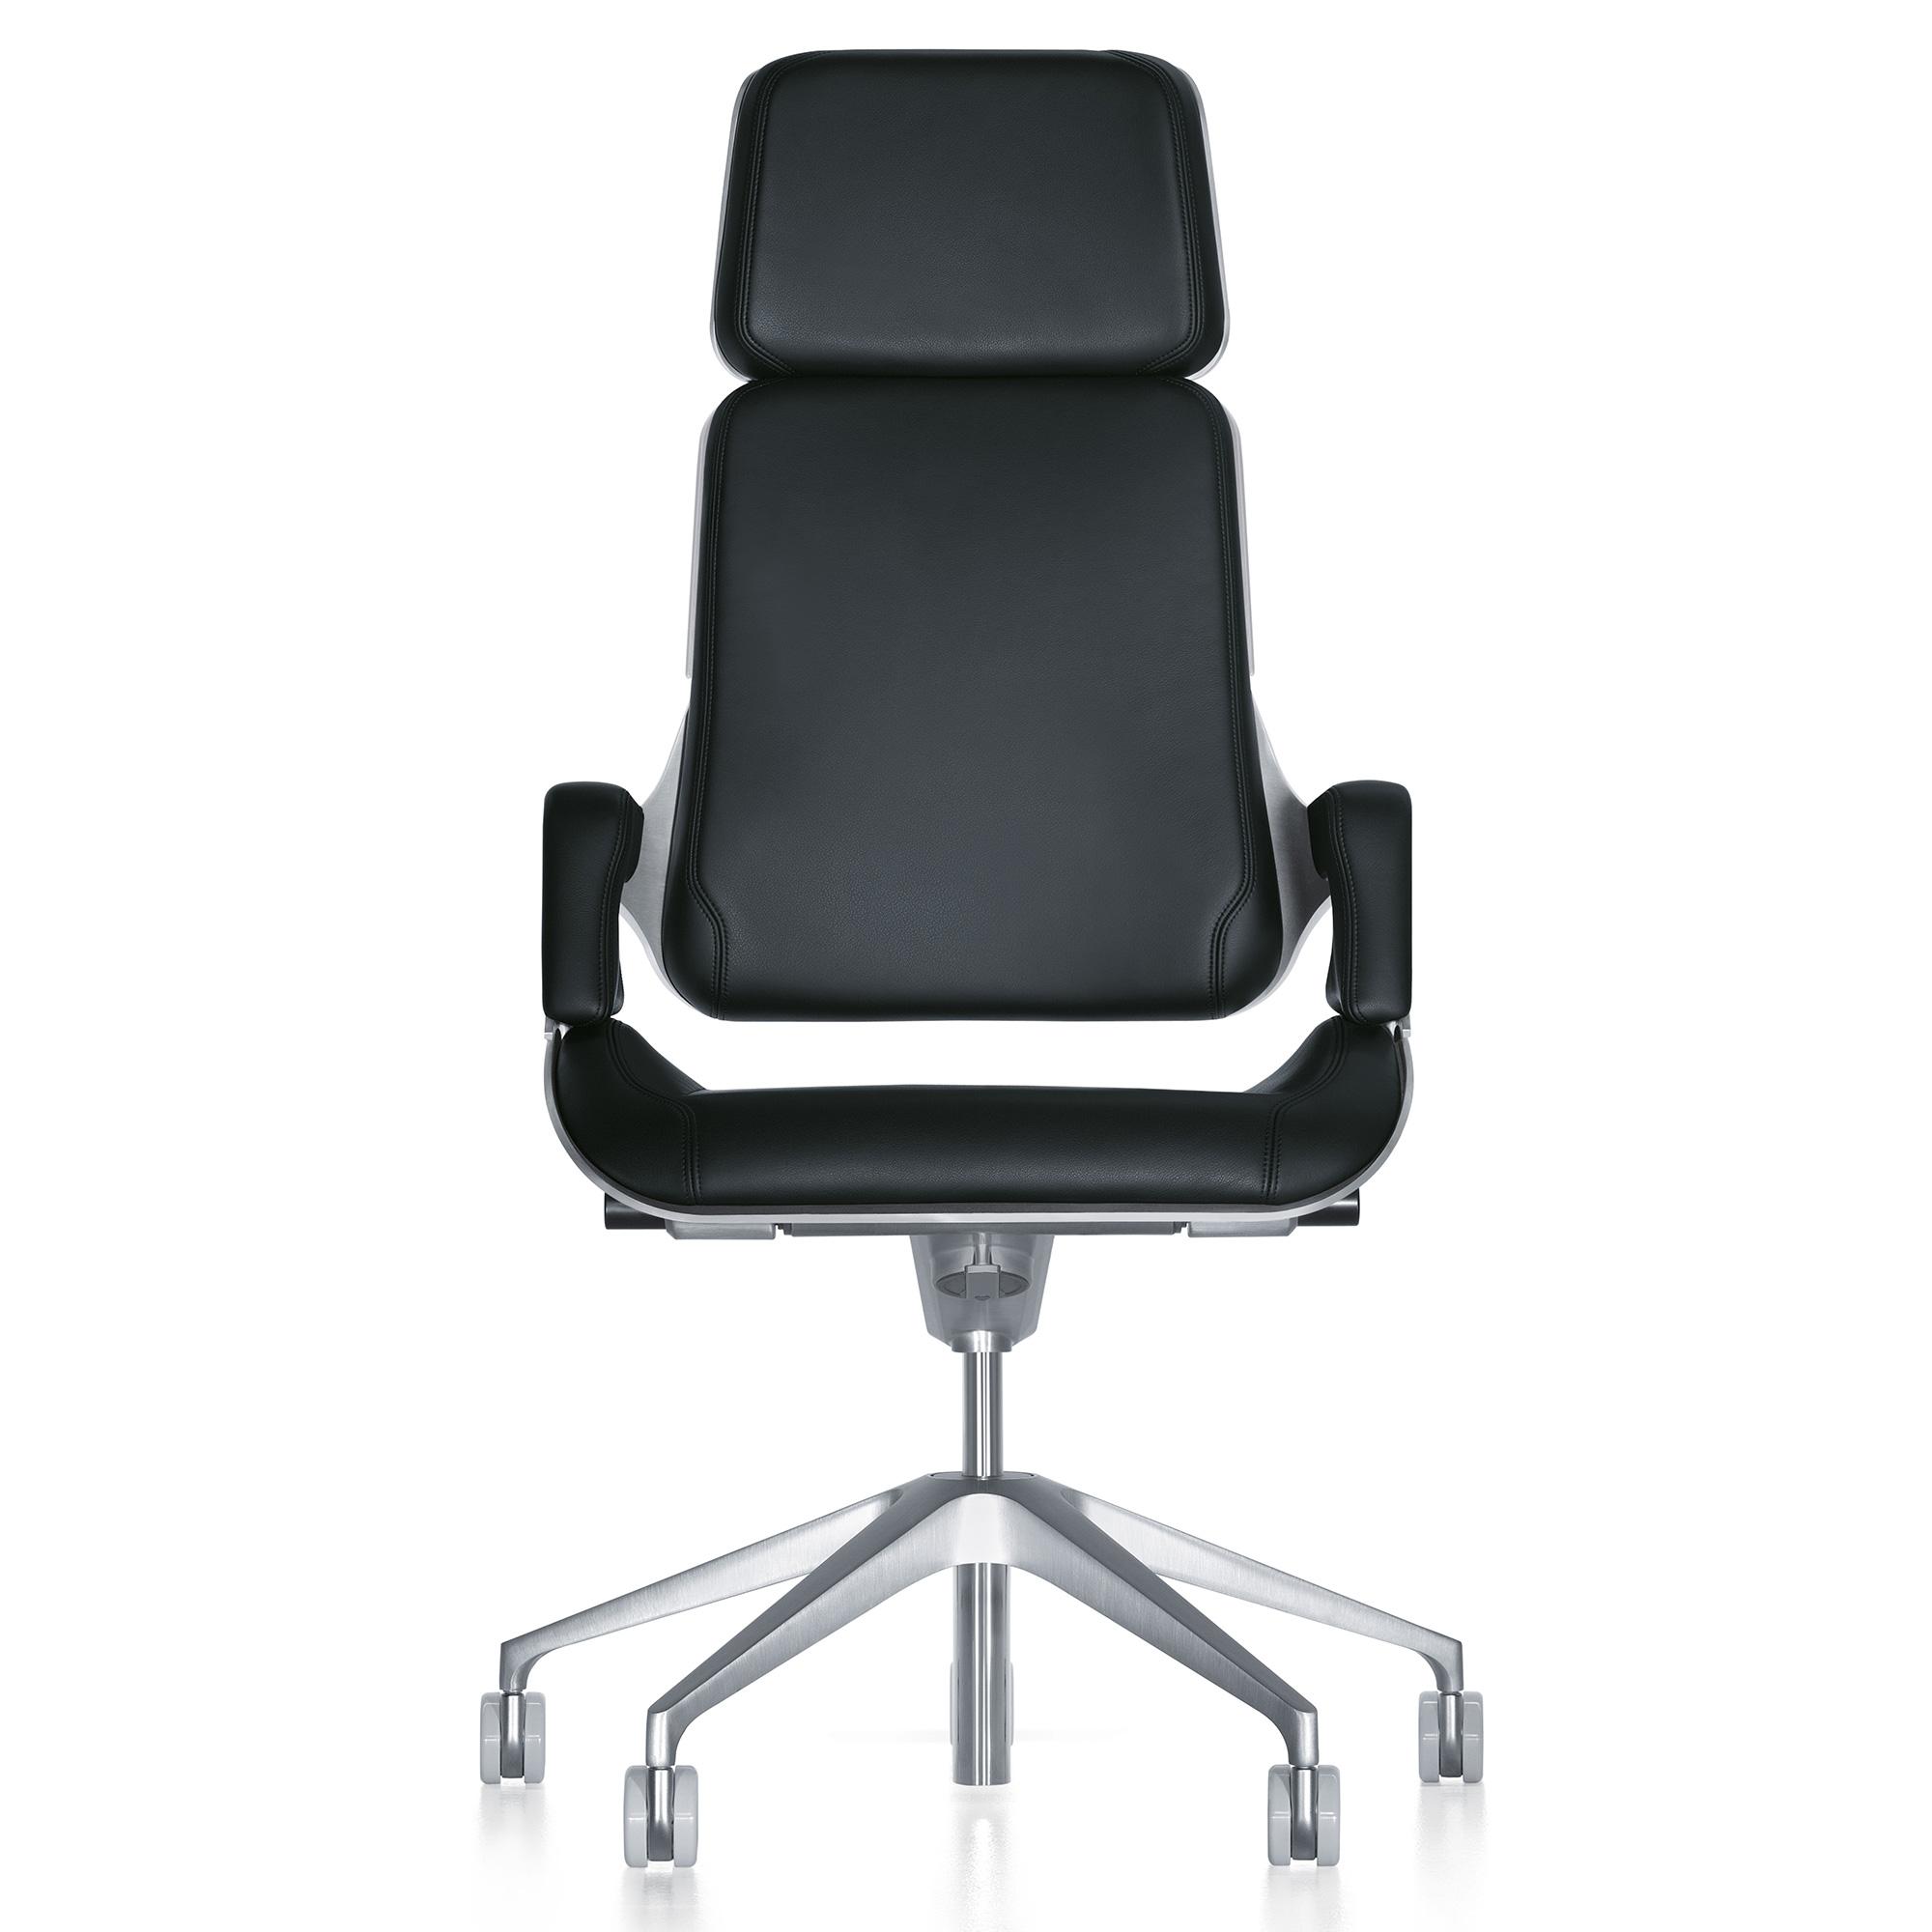 Interstuhl Silver 362S Bürostuhl für das moderne Chefbüro